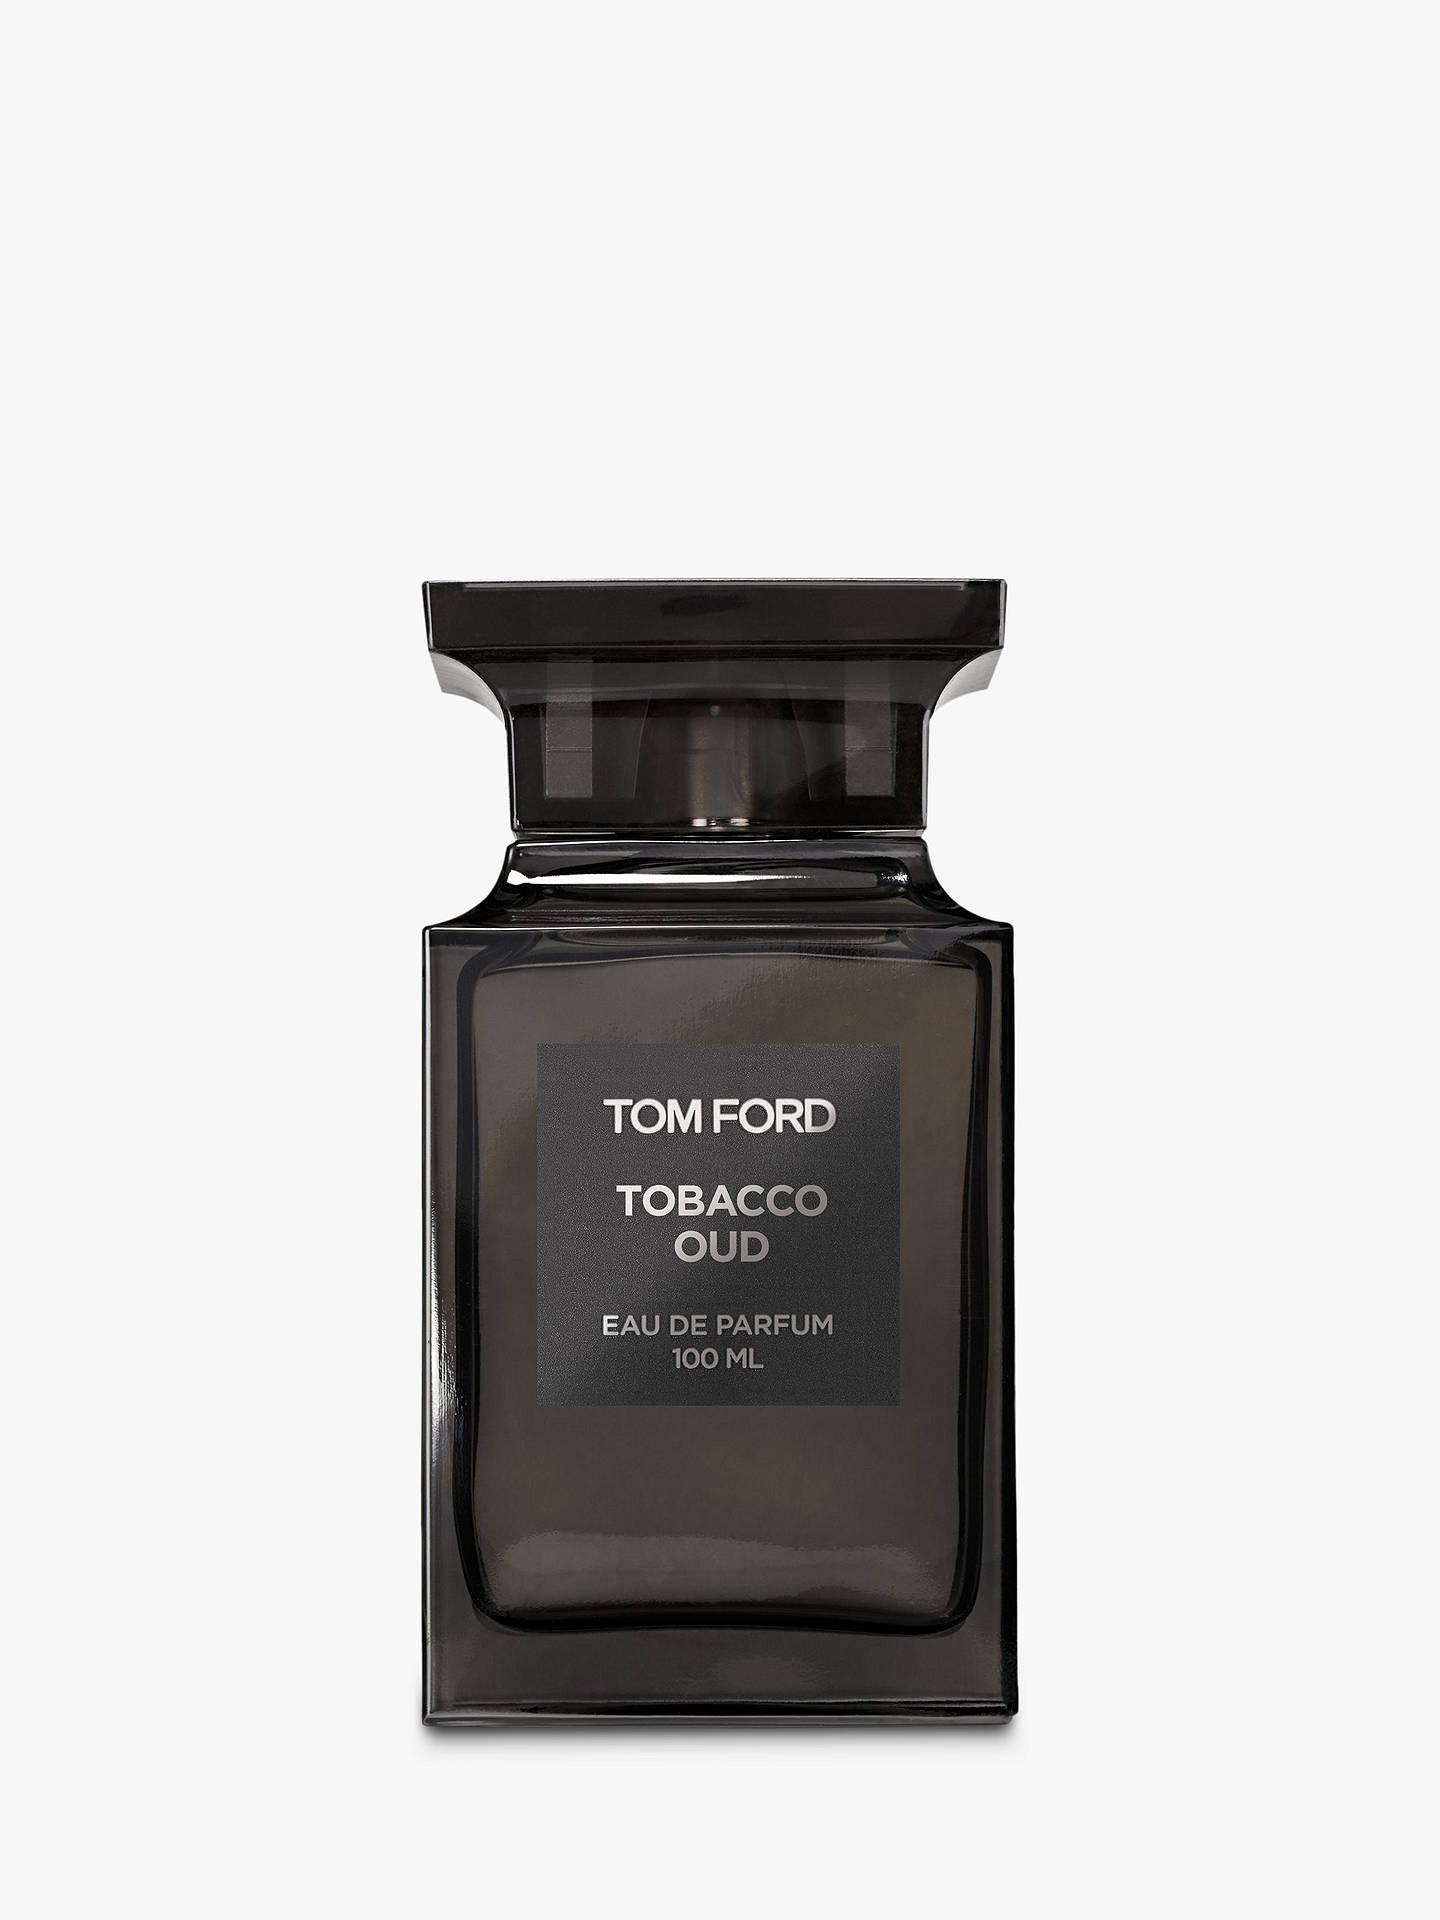 5c5319730d4b4 Buy TOM FORD Private Blend Tobacco Oud Eau De Parfum, 100ml Online at  johnlewis.